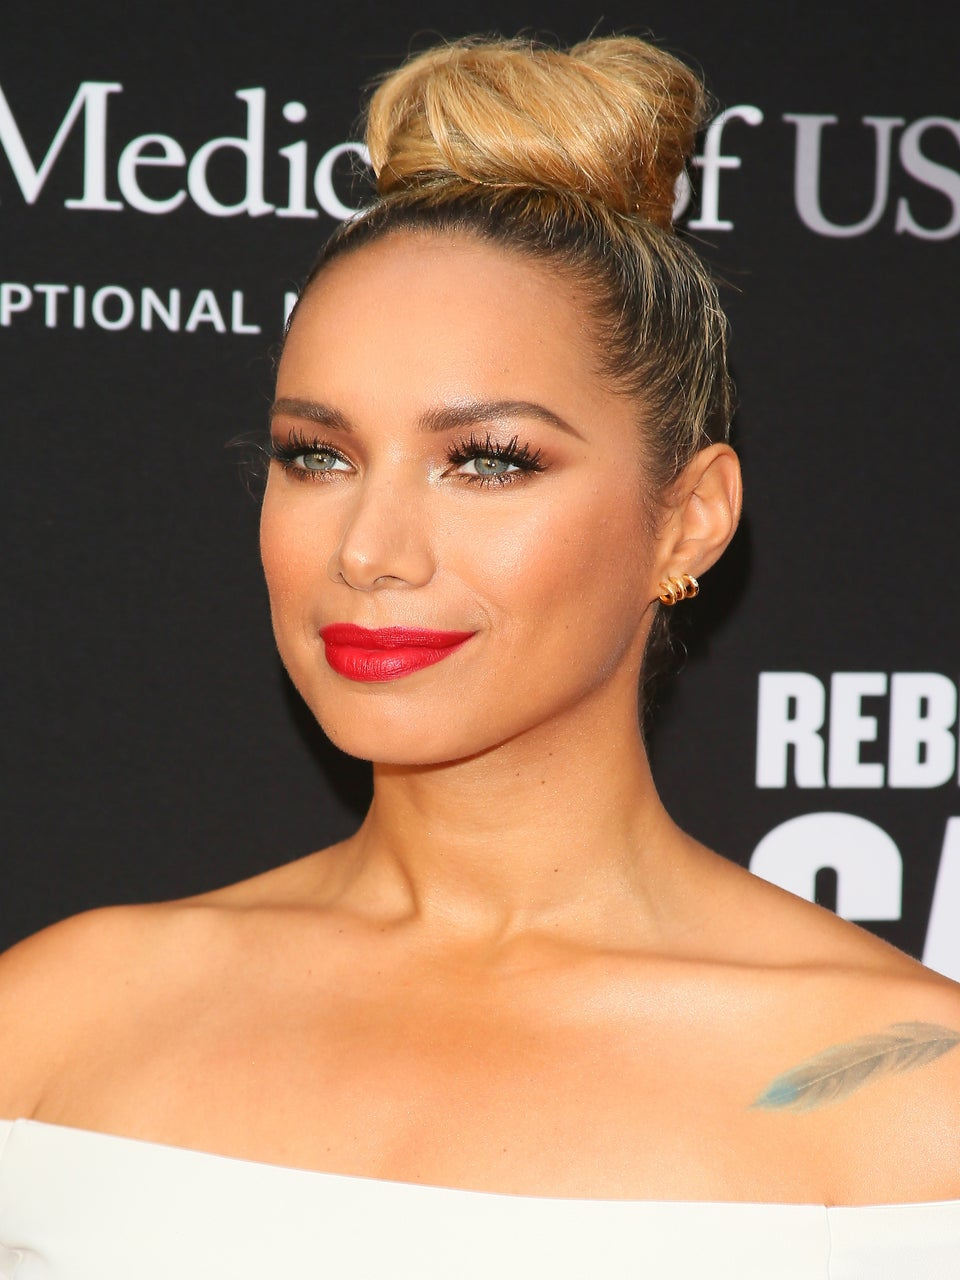 Leona Lewis Sings 'Avatar' Theme Song